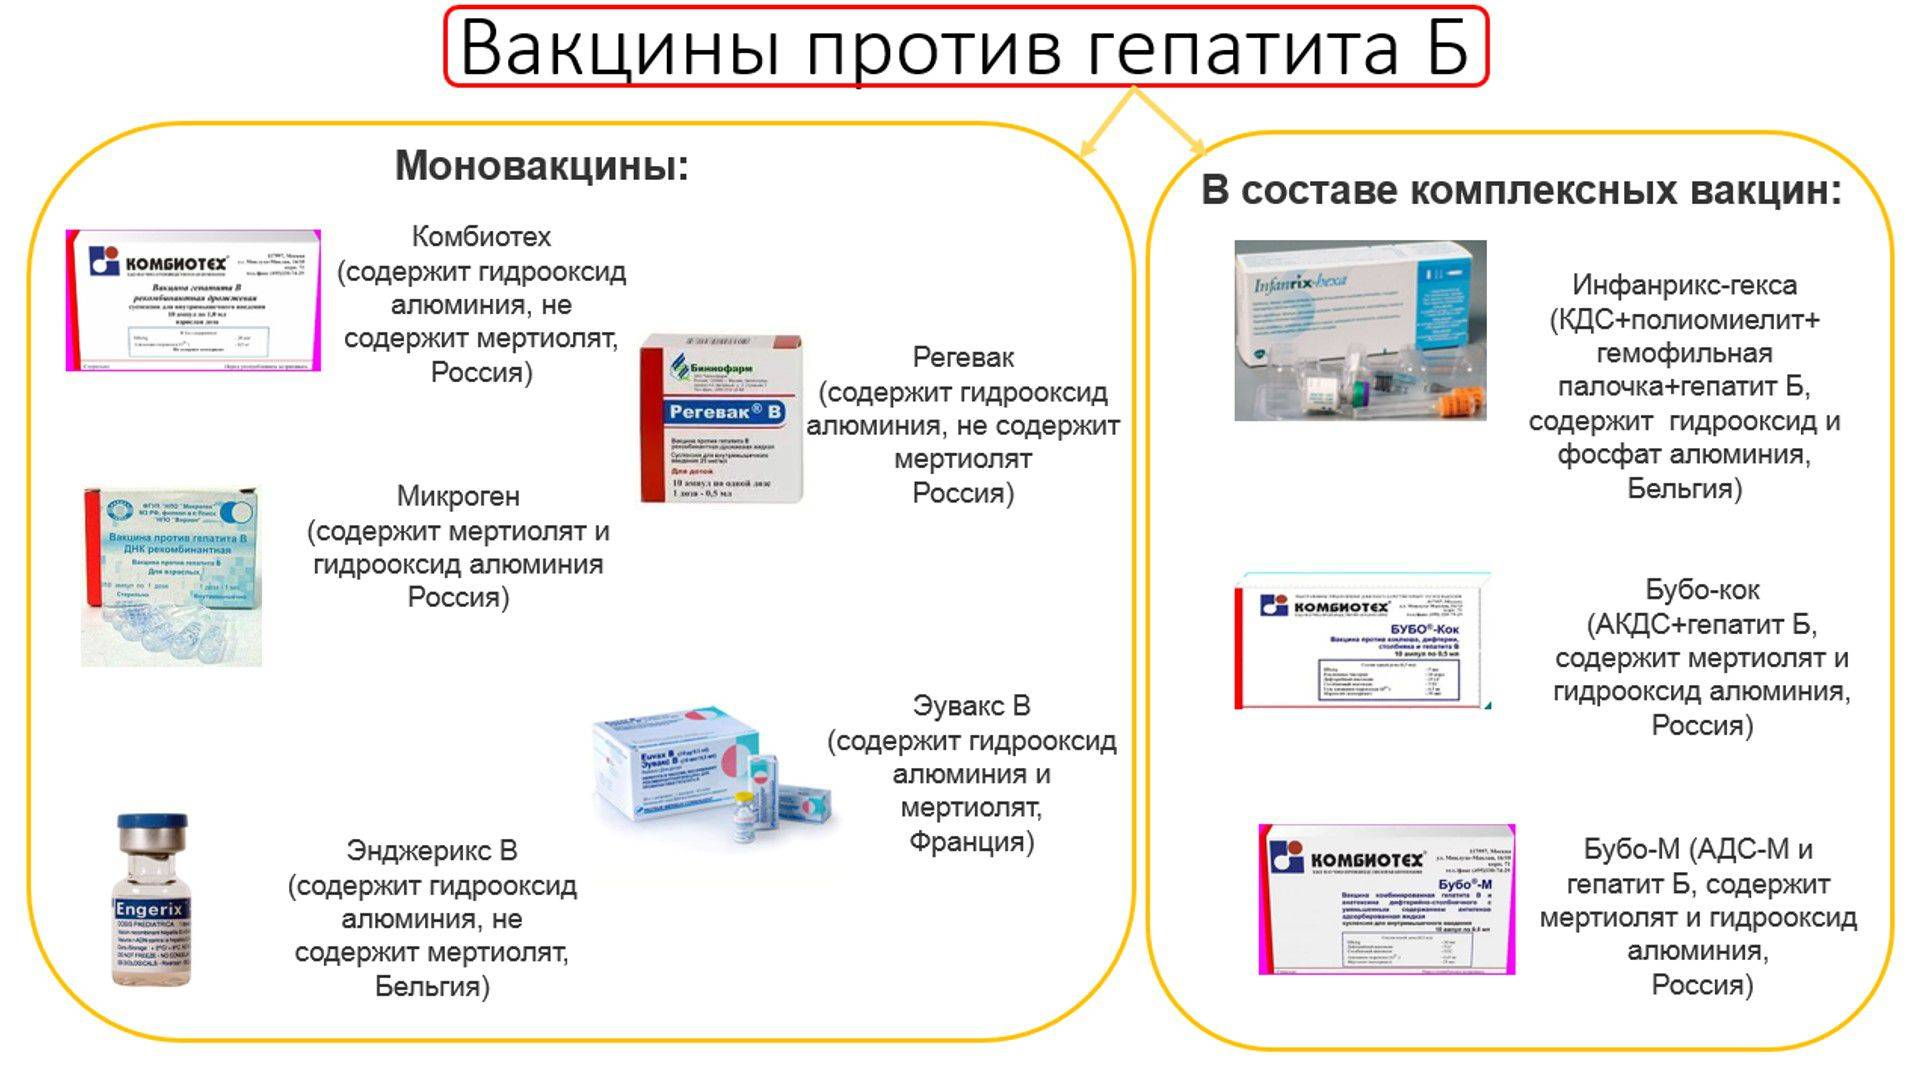 Вакцина против вирусного гепатита б, график